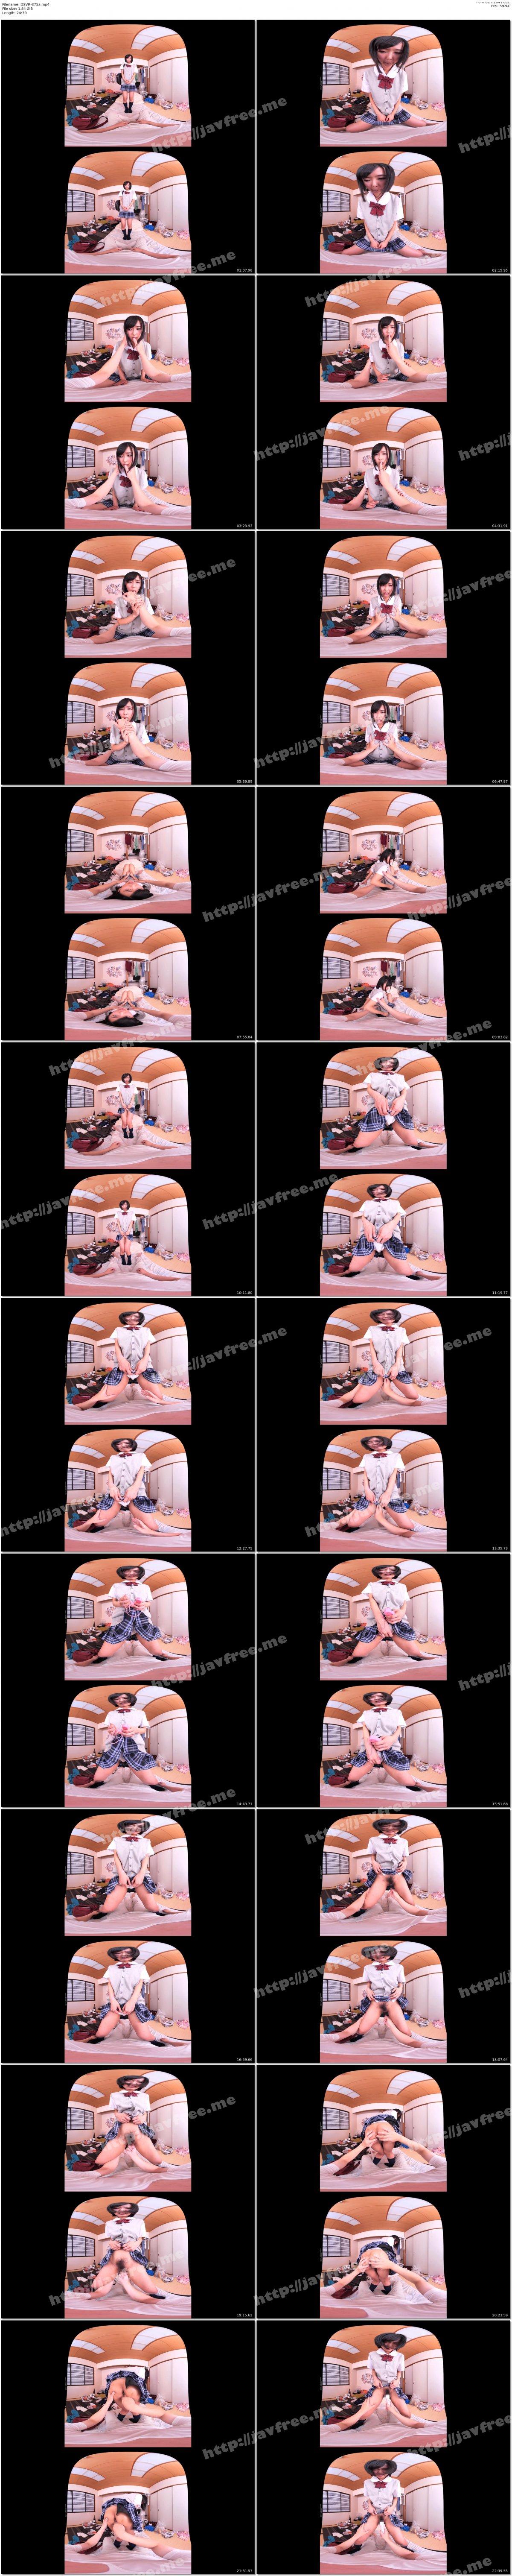 [DSVR-375] 【VR】真面目そうな訳アリ女子○生を汚部屋連れ込み変態凌辱援交 - image DSVR-375a on https://javfree.me